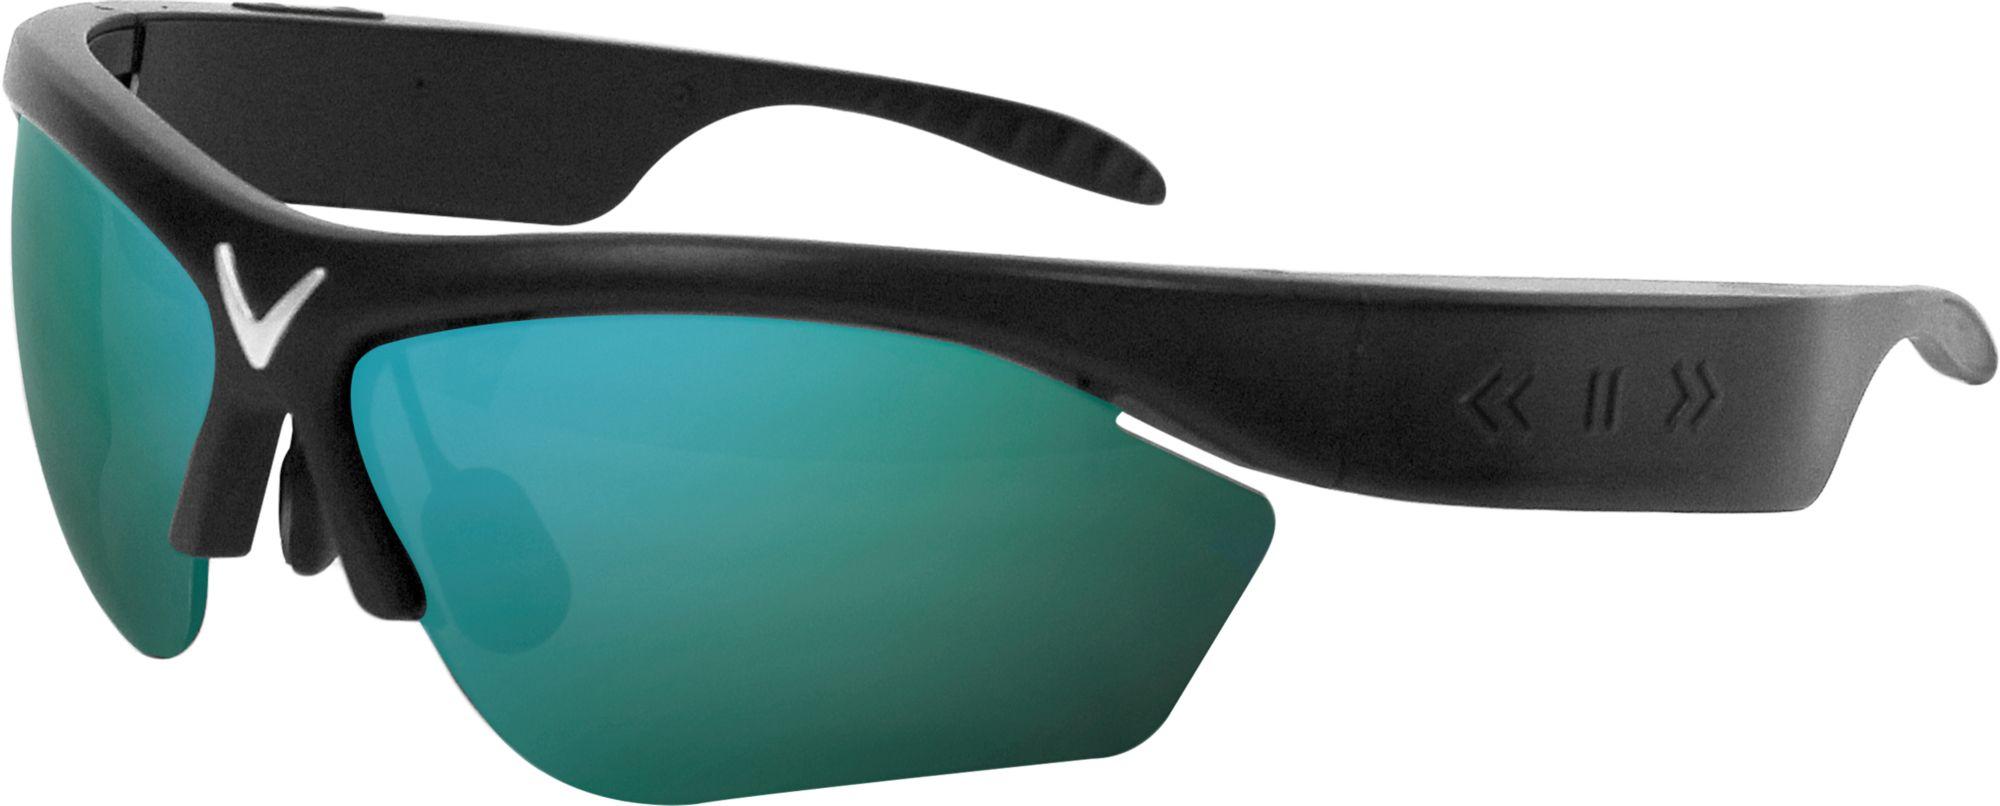 Best Sunglasses in Golf - Callaway Smart Polarized